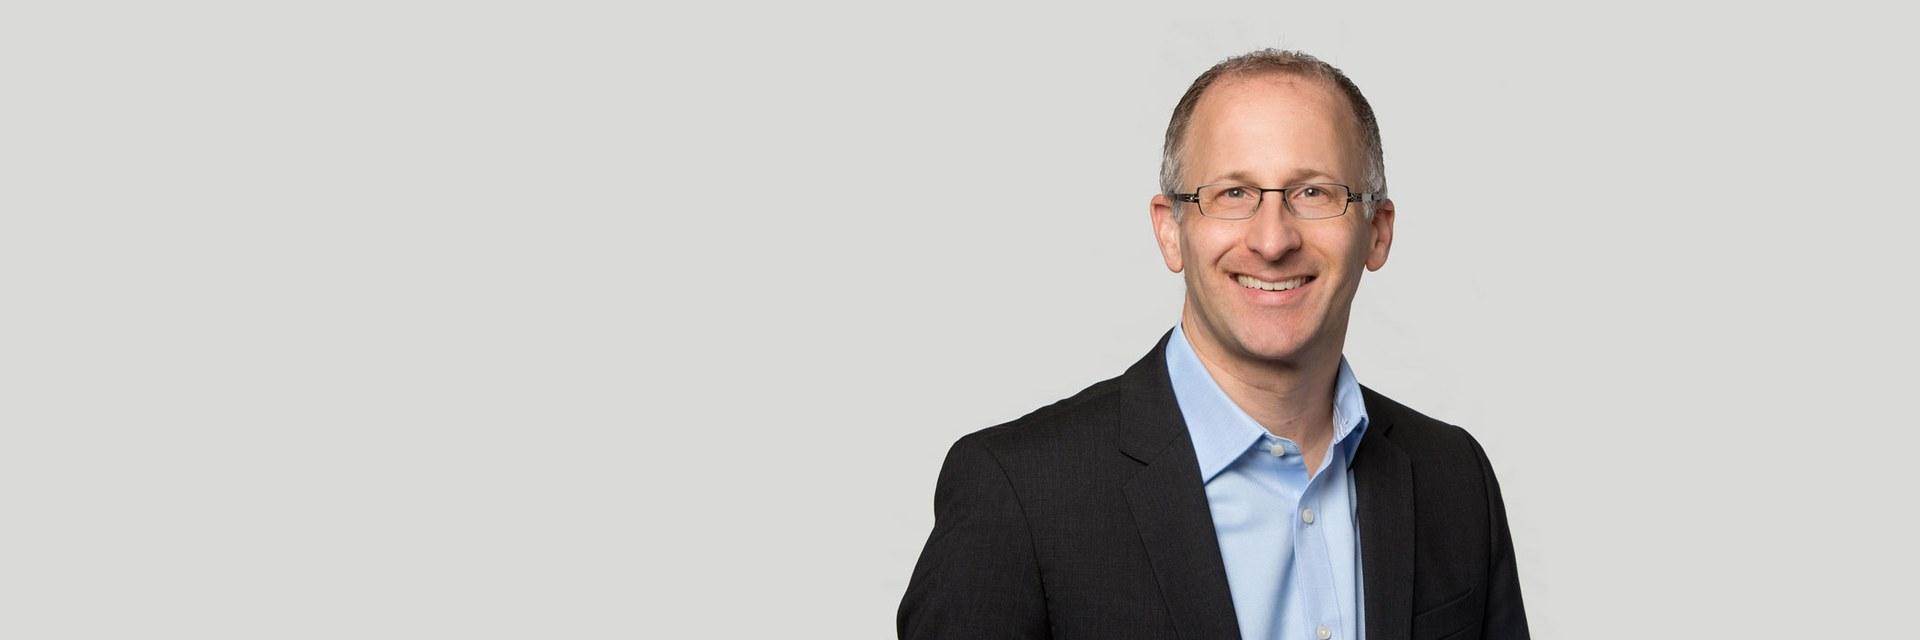 Prof. Dr. Marc K. Peter